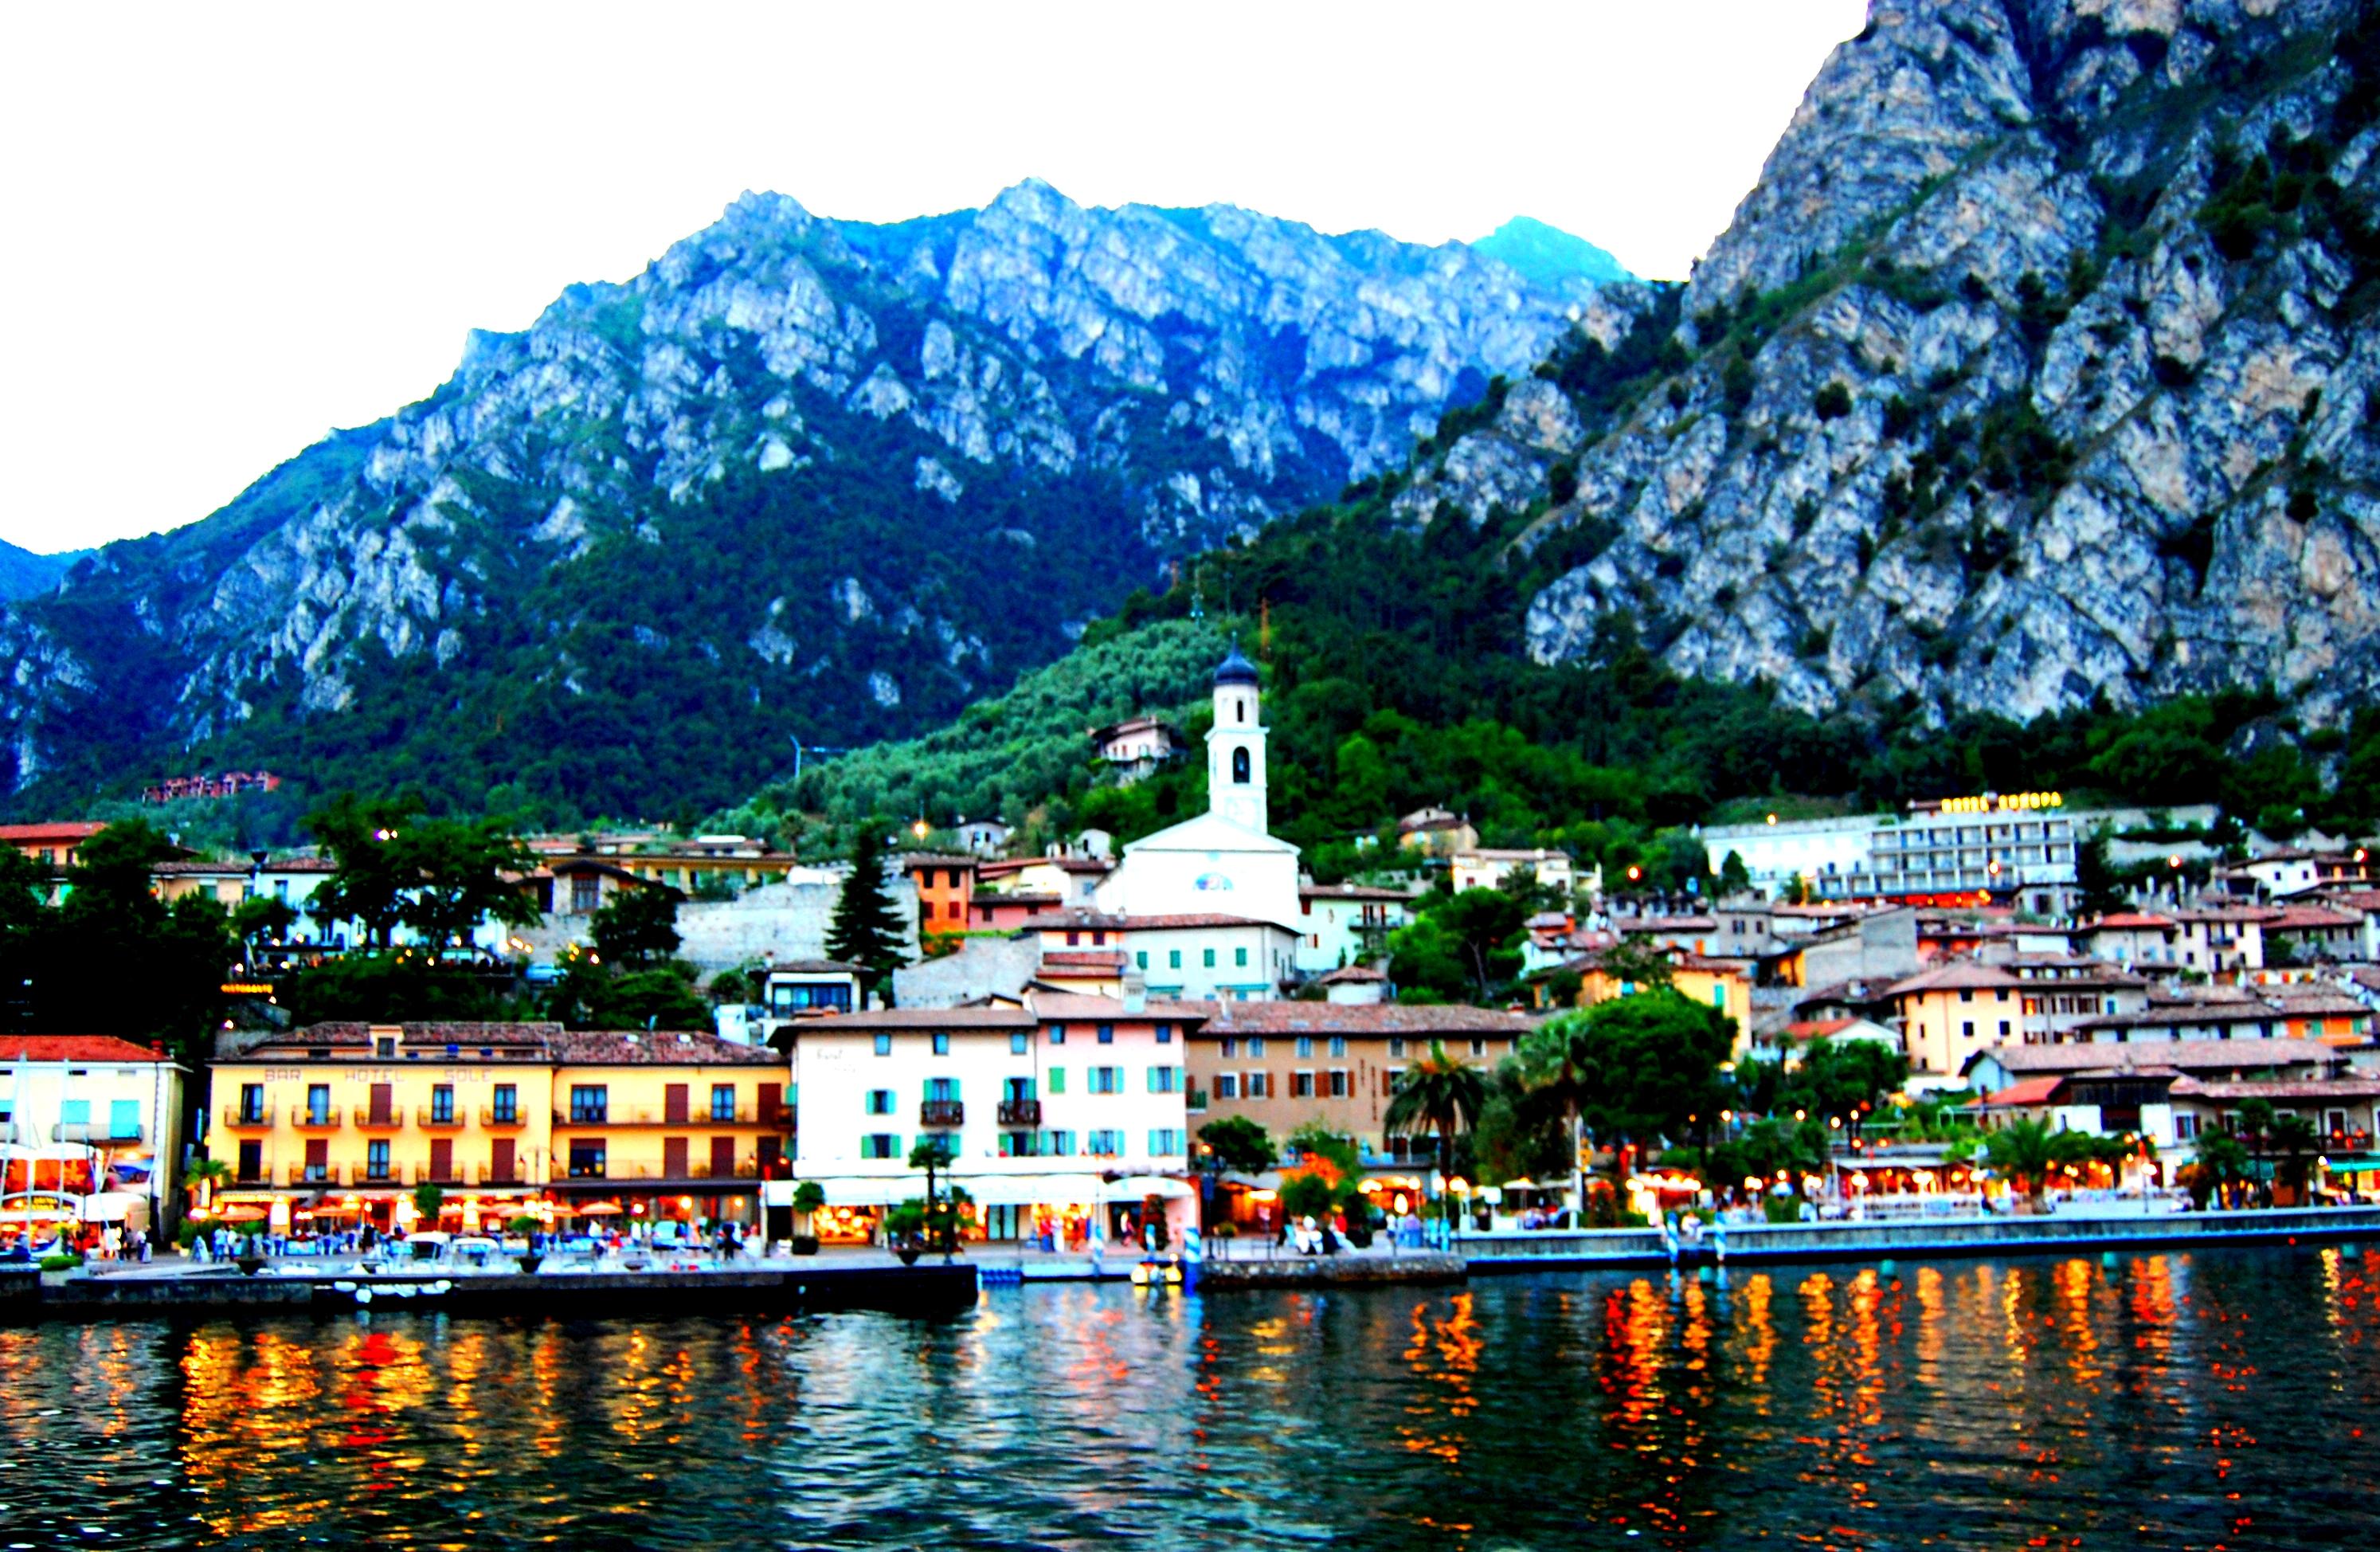 Photography  Lake Garda  Italy  Mountains castles and